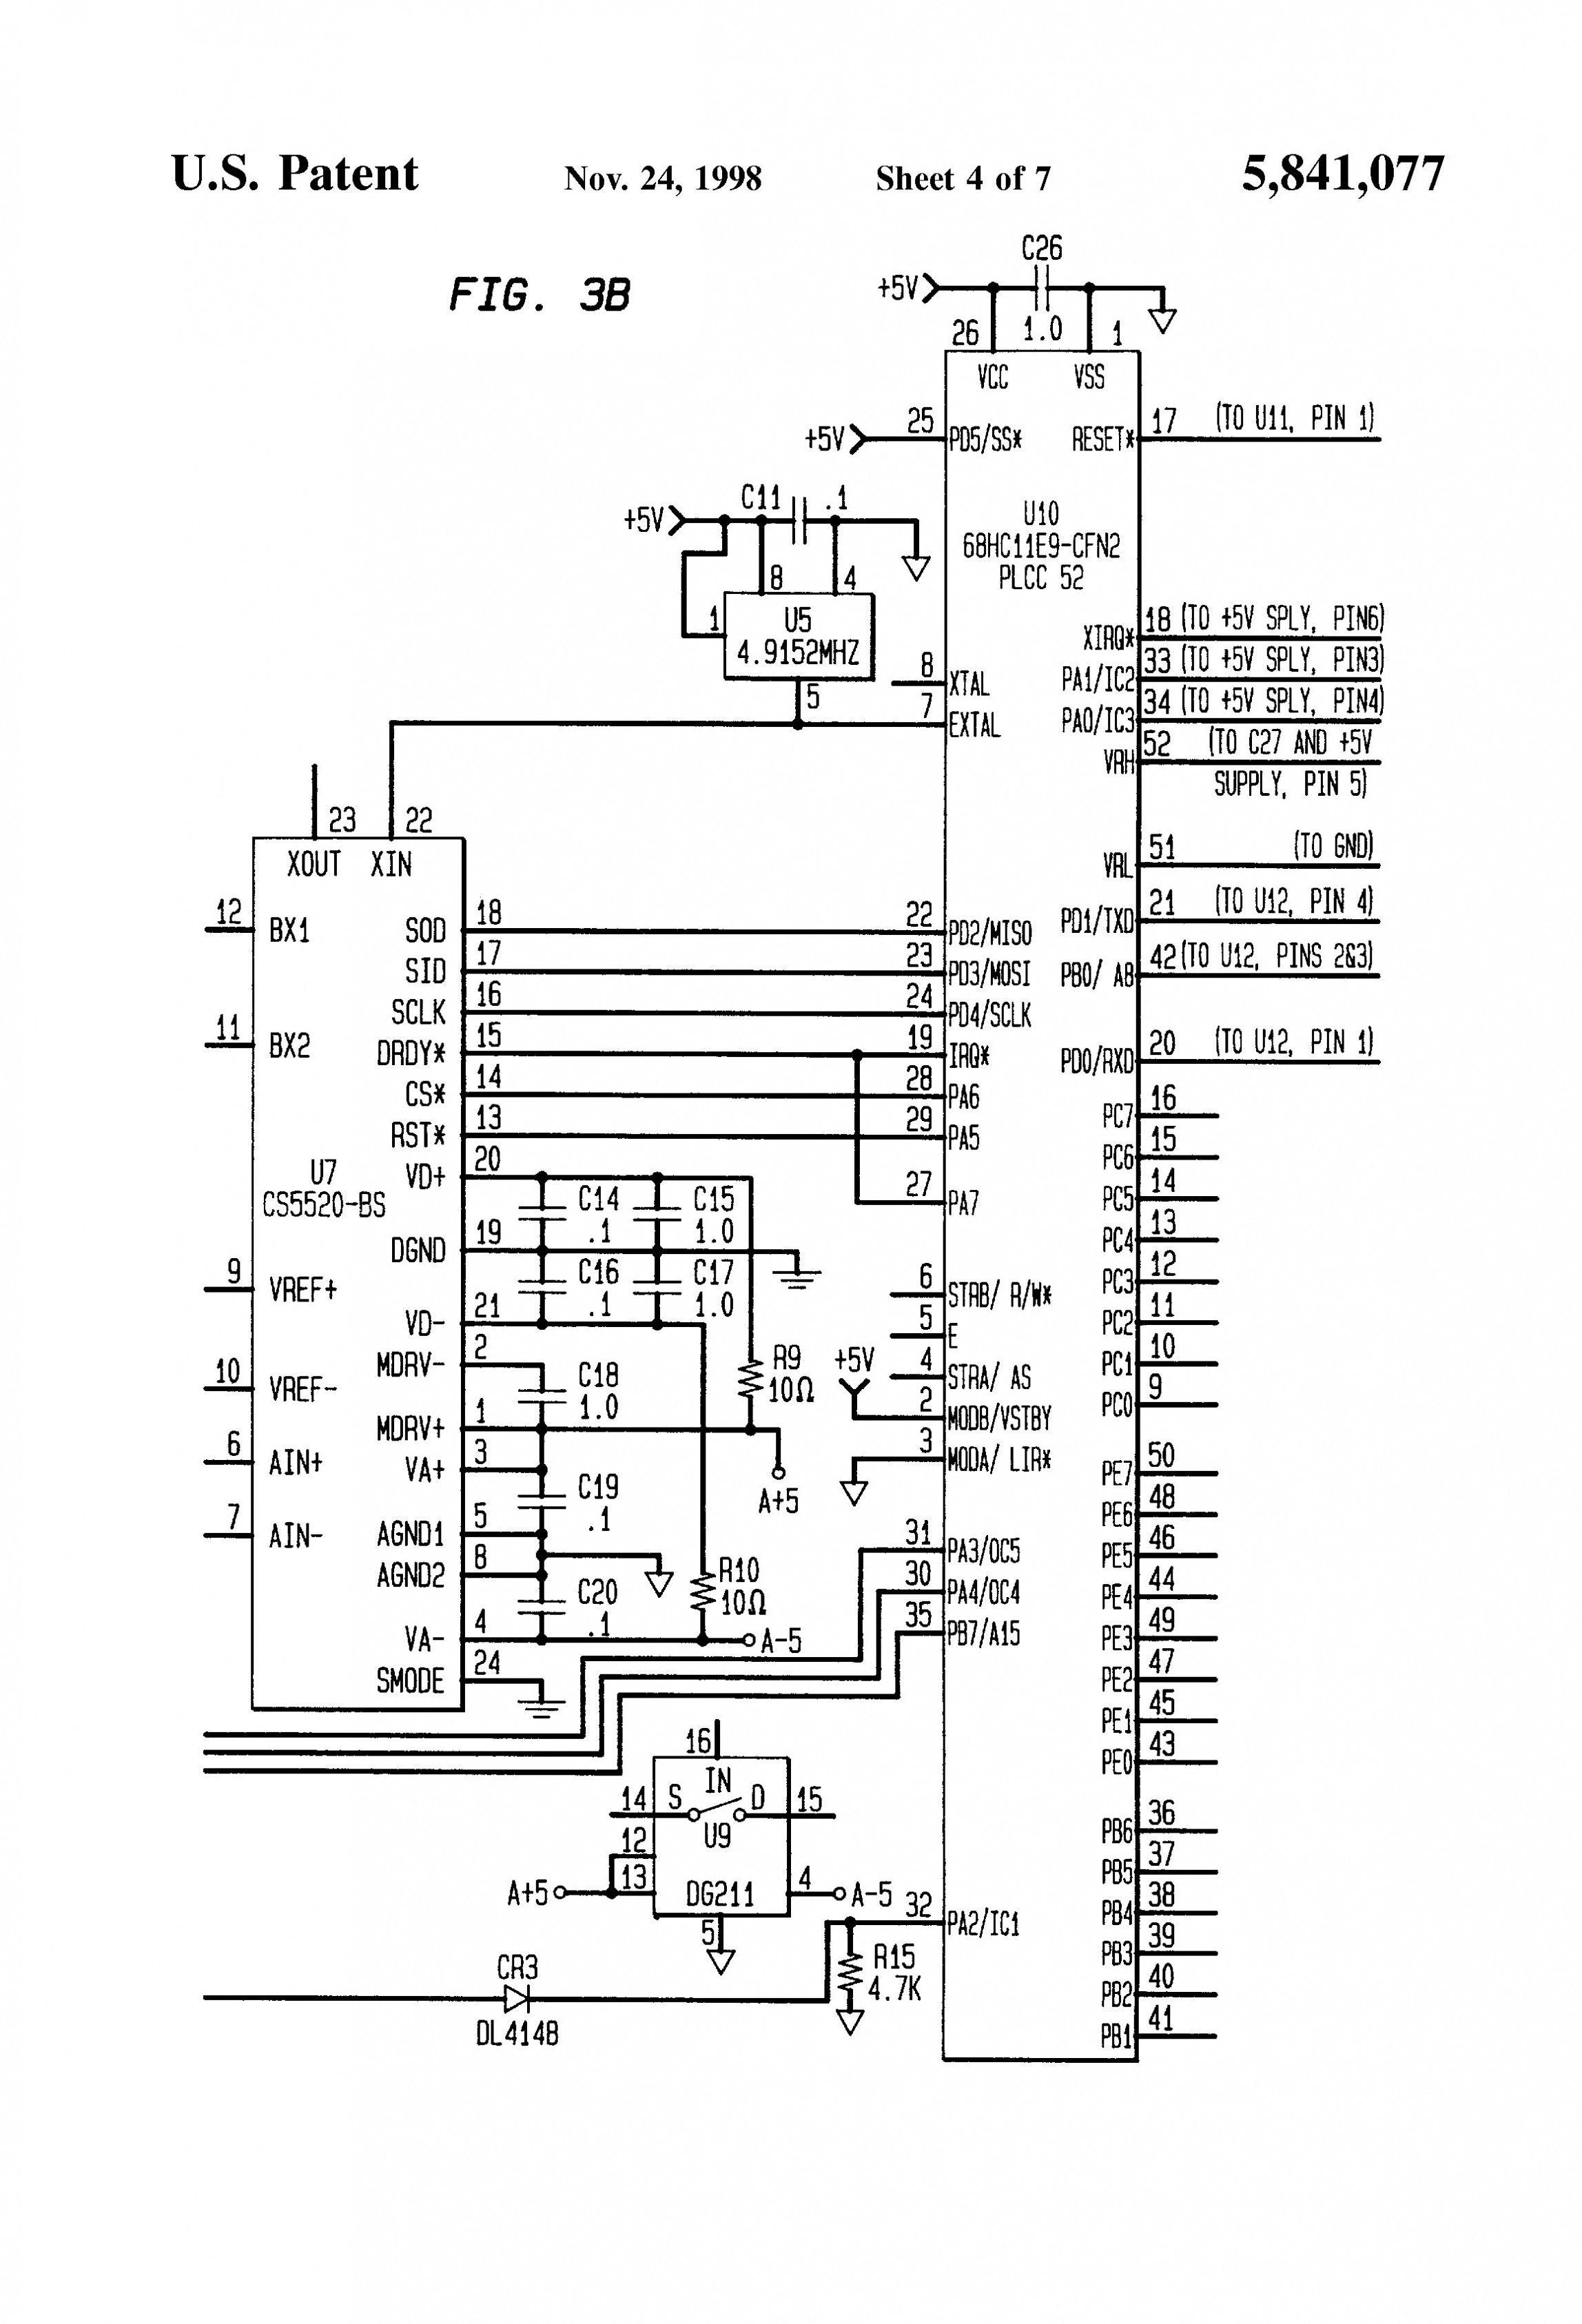 [DIAGRAM_5LK]  Unique Ovation Guitar Wiring Diagram #diagram #diagramsample  #diagramtemplate #wiringdiagram #diagramchart #worksheet #worksheett… |  Ovation guitar, Diagram, Guitar | Ovation Wiring Harness |  | Pinterest